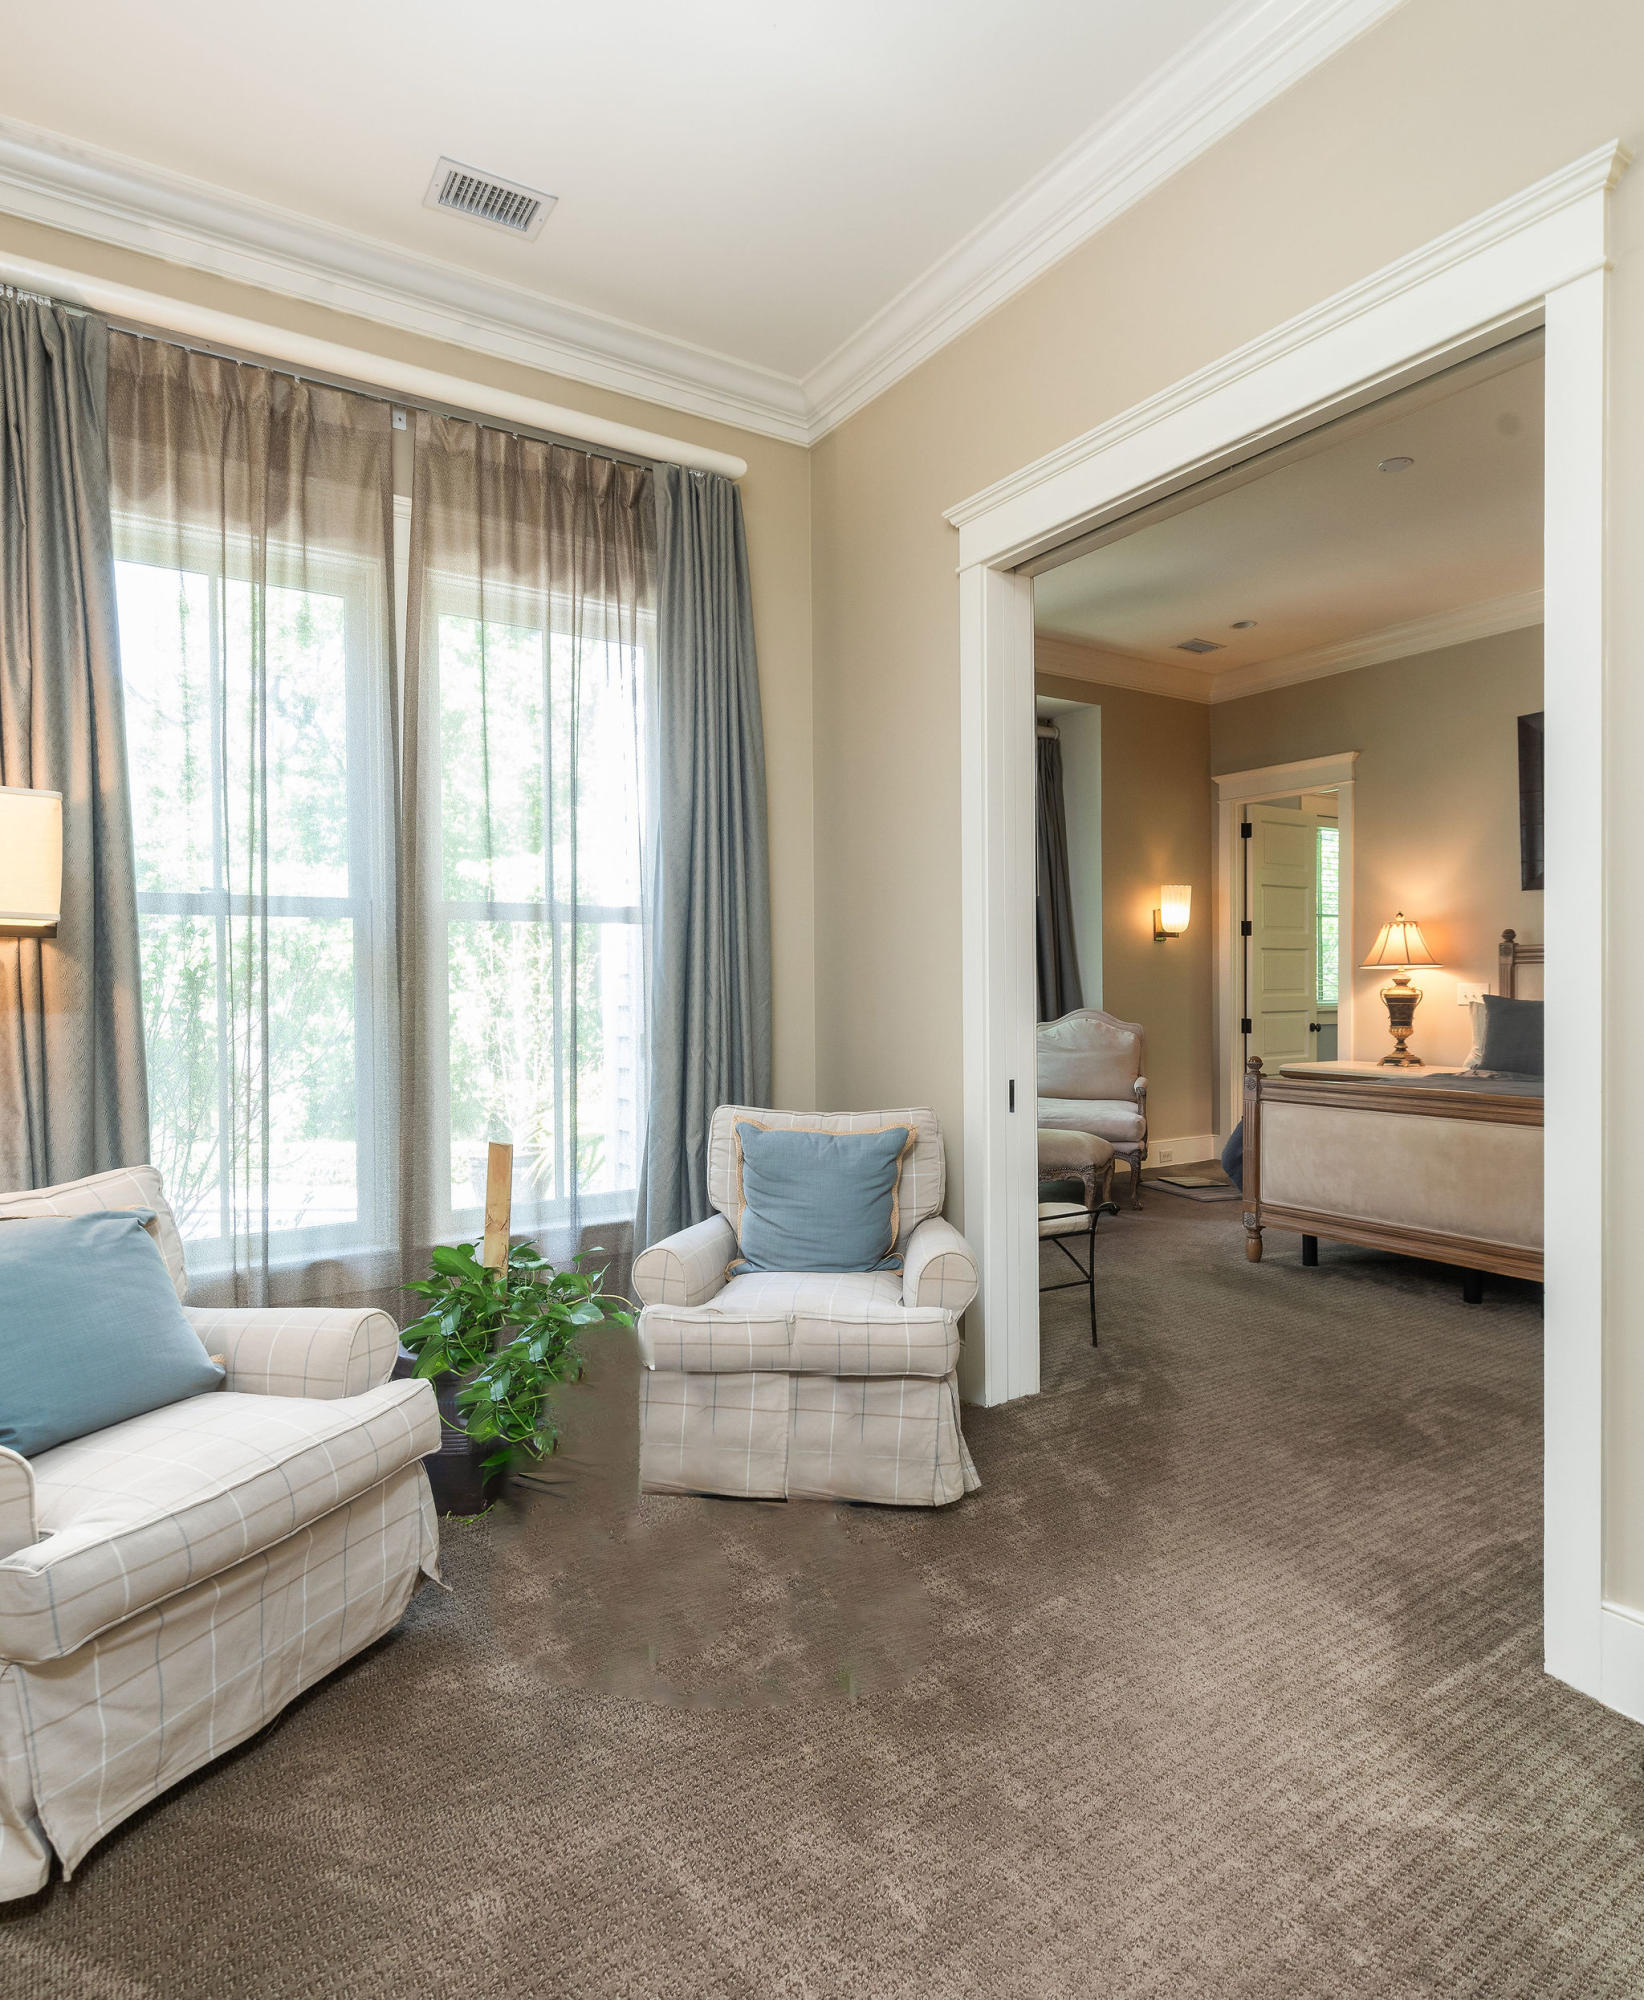 Ion Homes For Sale - 50 Hopetown, Mount Pleasant, SC - 0